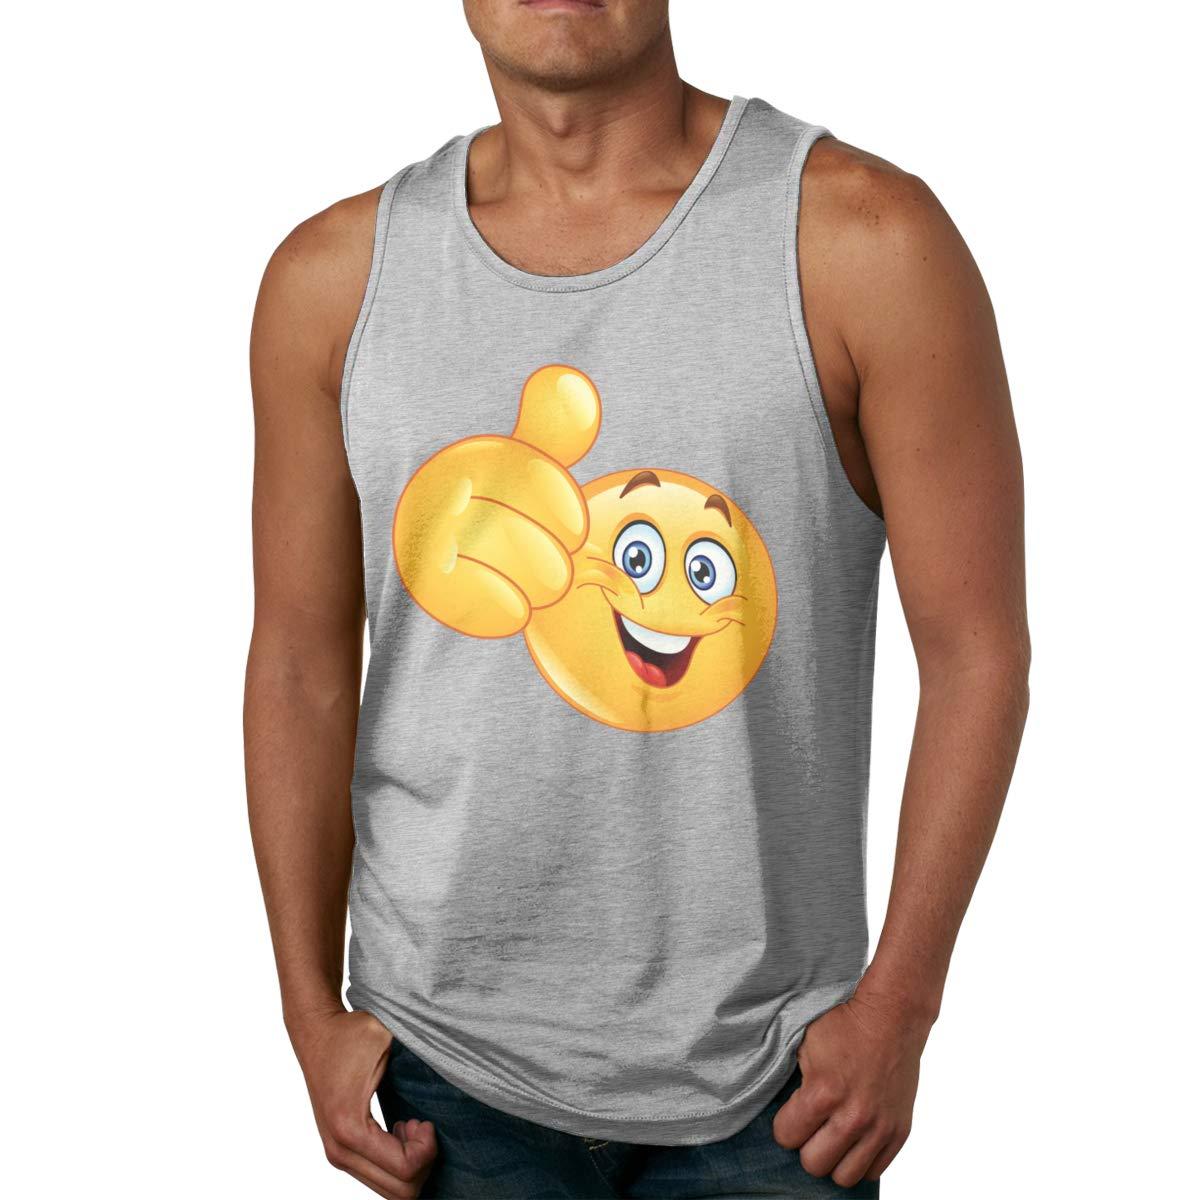 Seuriamin Smiley Face Thumb Up S Fashion Gym Sleeveless Tank Top Shirt